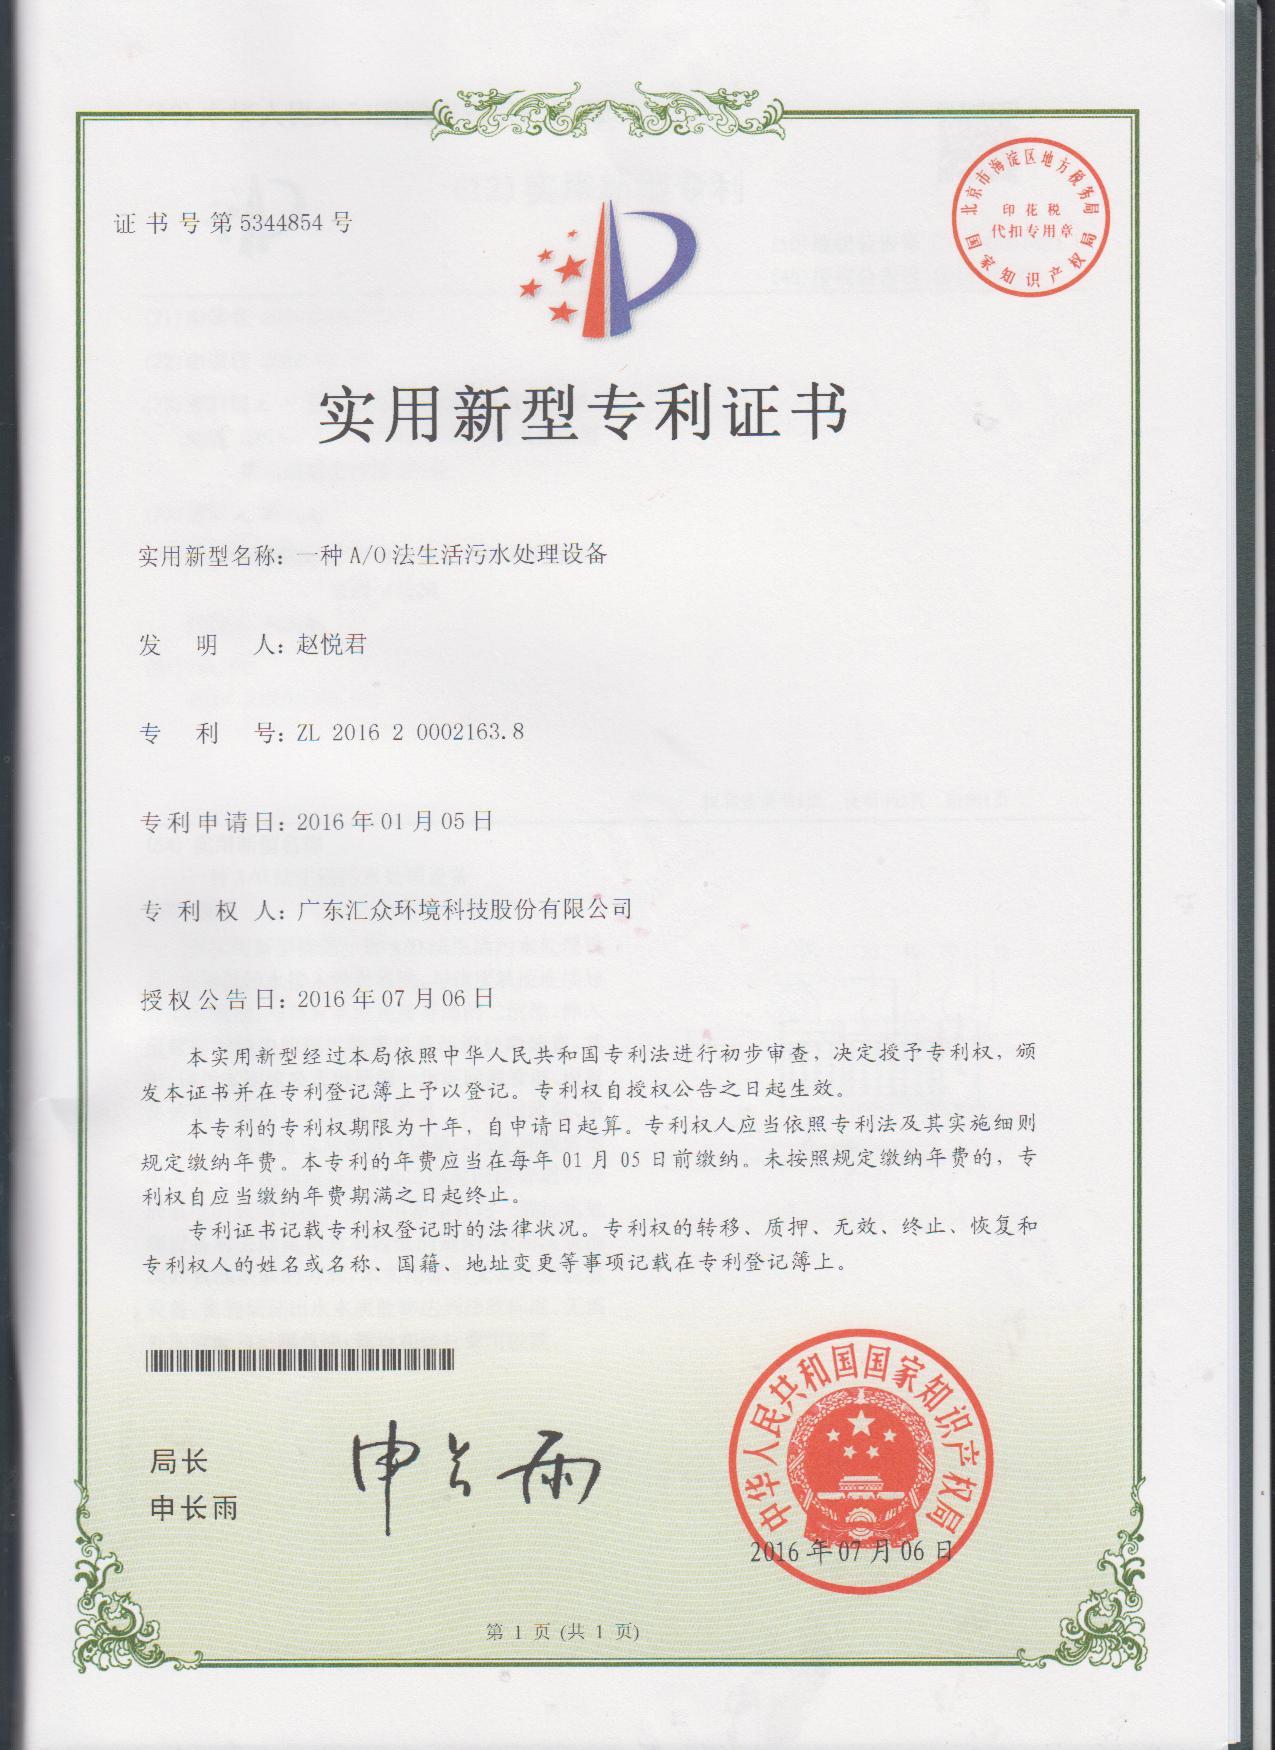 A/o法生活污水处理设备专利证书